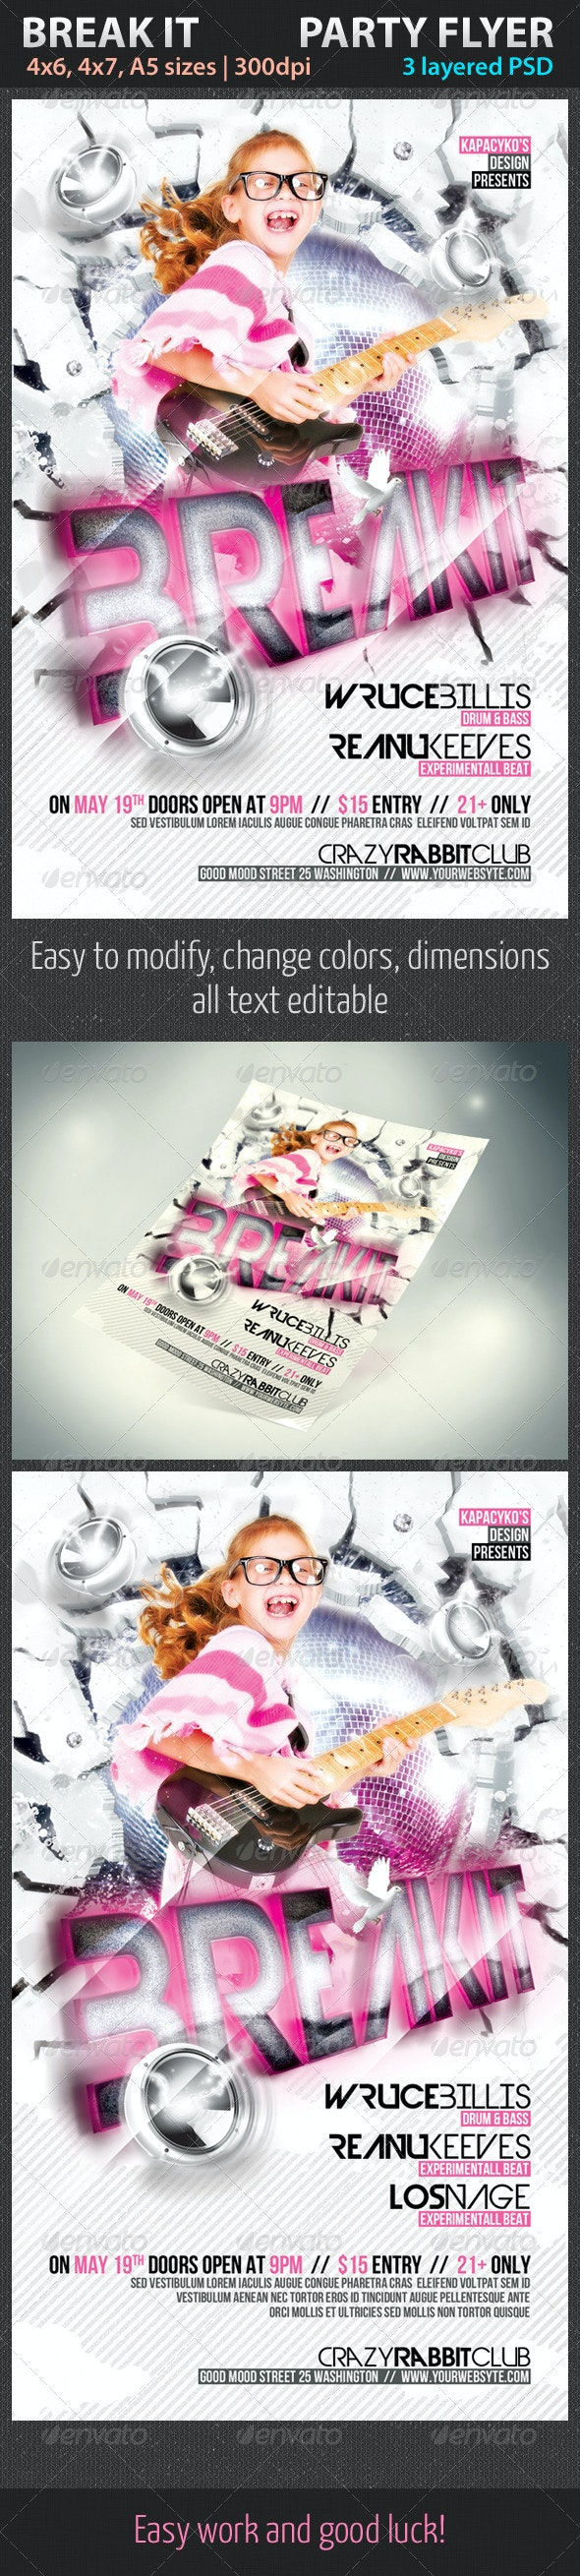 Break it Party Flyer - Clubs & Parties Events